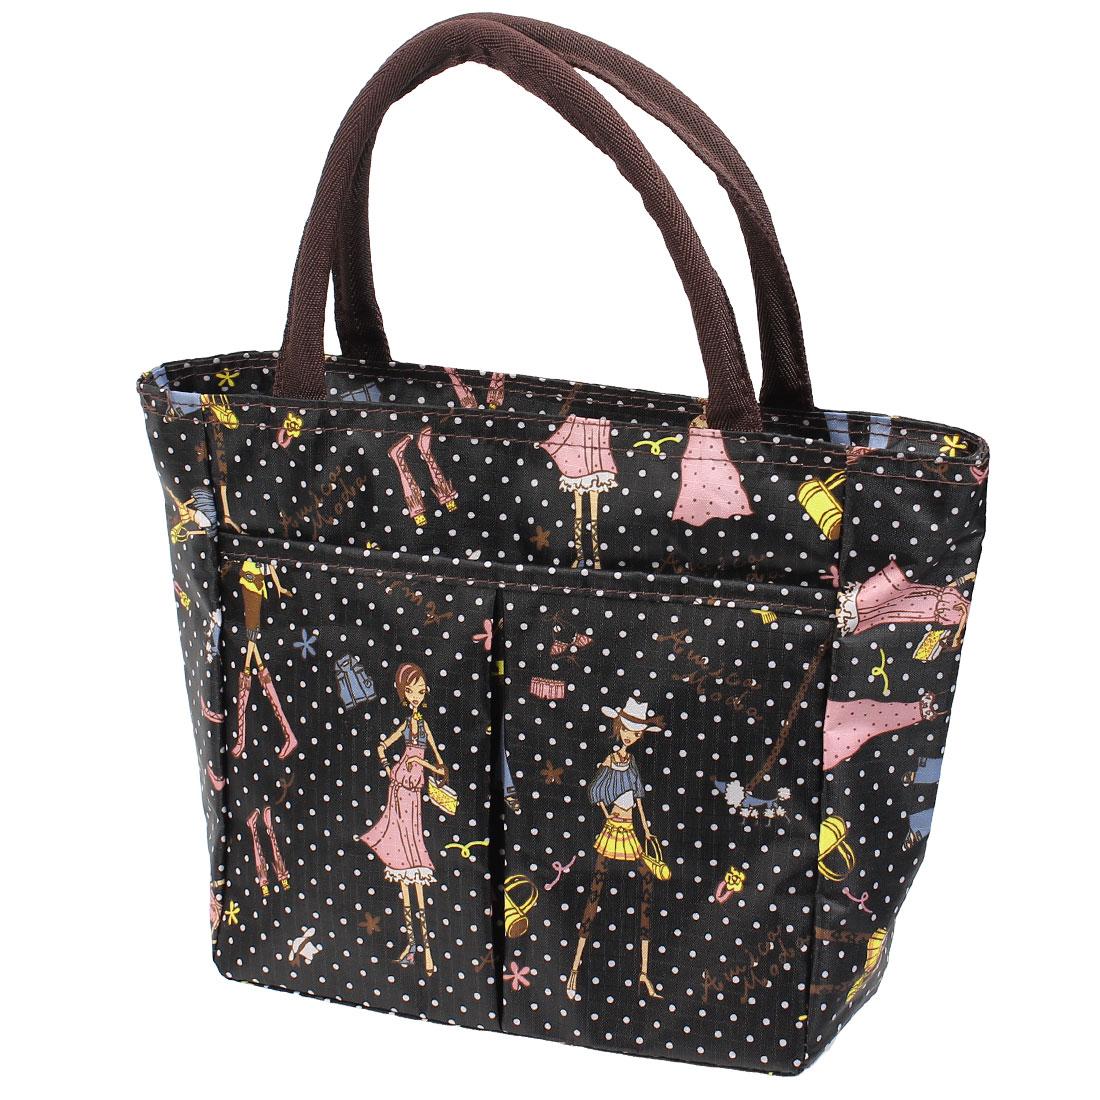 Portable Canvas Brown Zip up Cartoon Pattern Shopping Handbag Bag